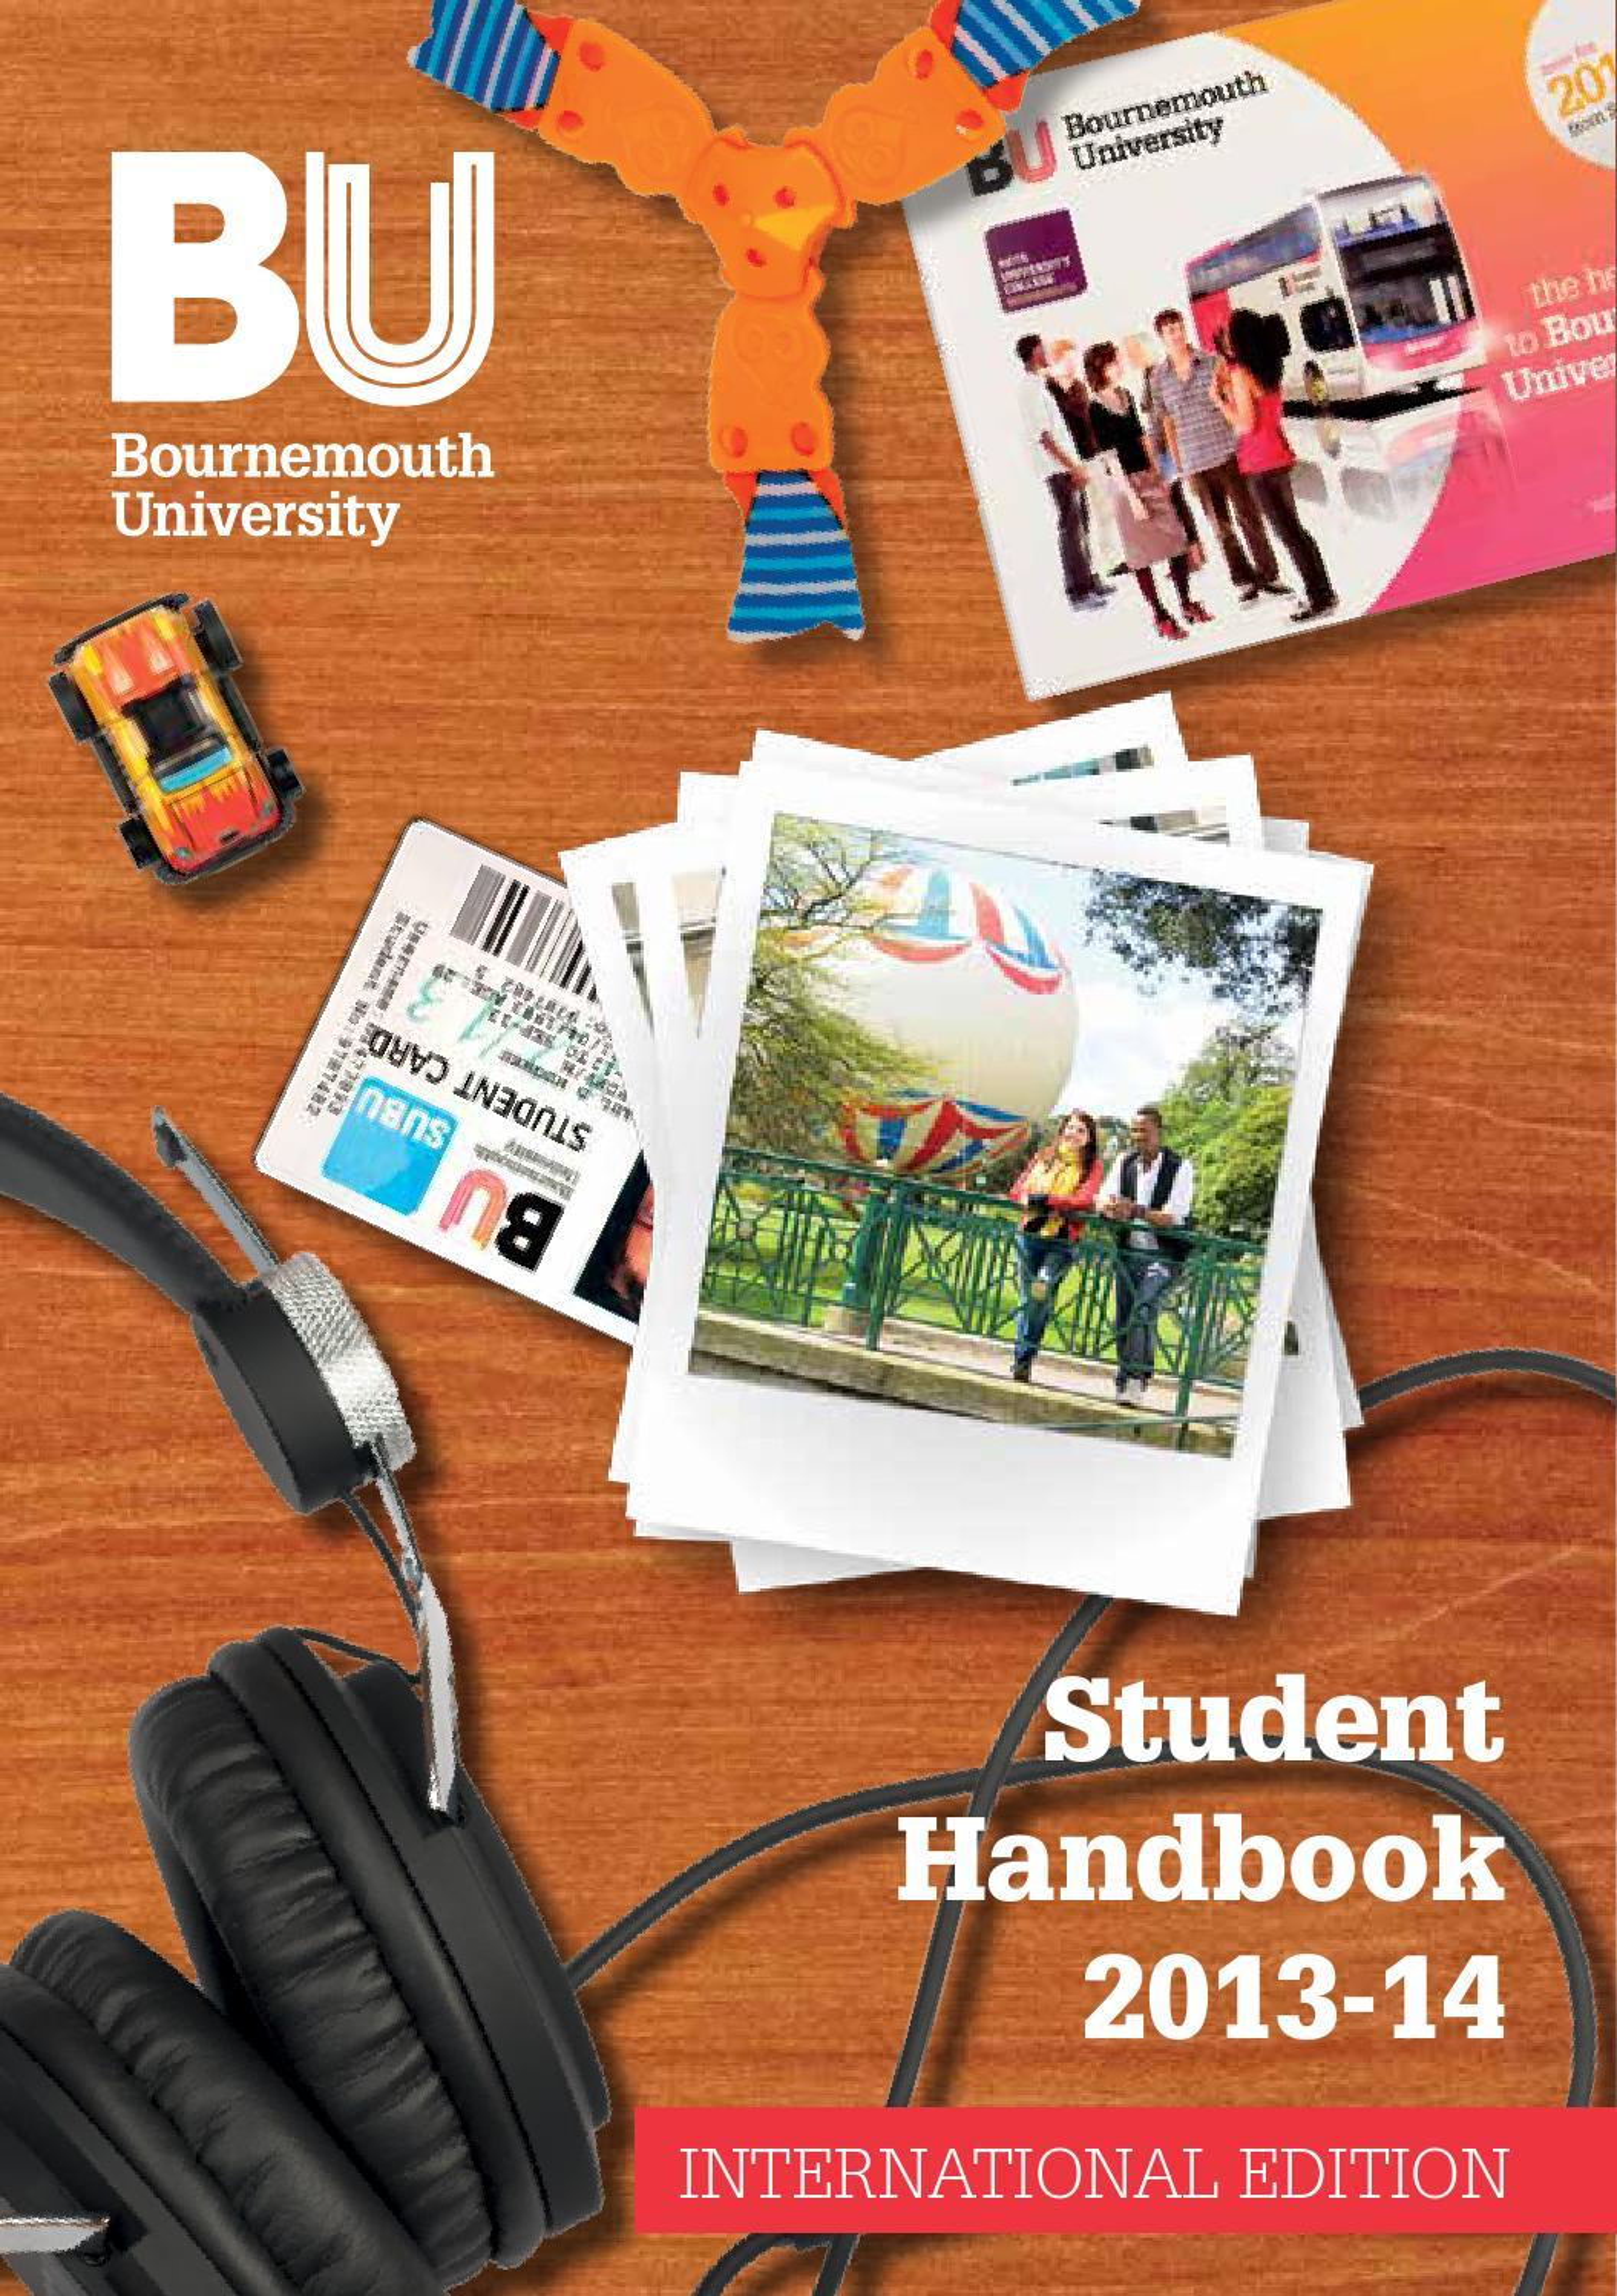 Bournemouth University Student Handbook 2013 14 International Edition By